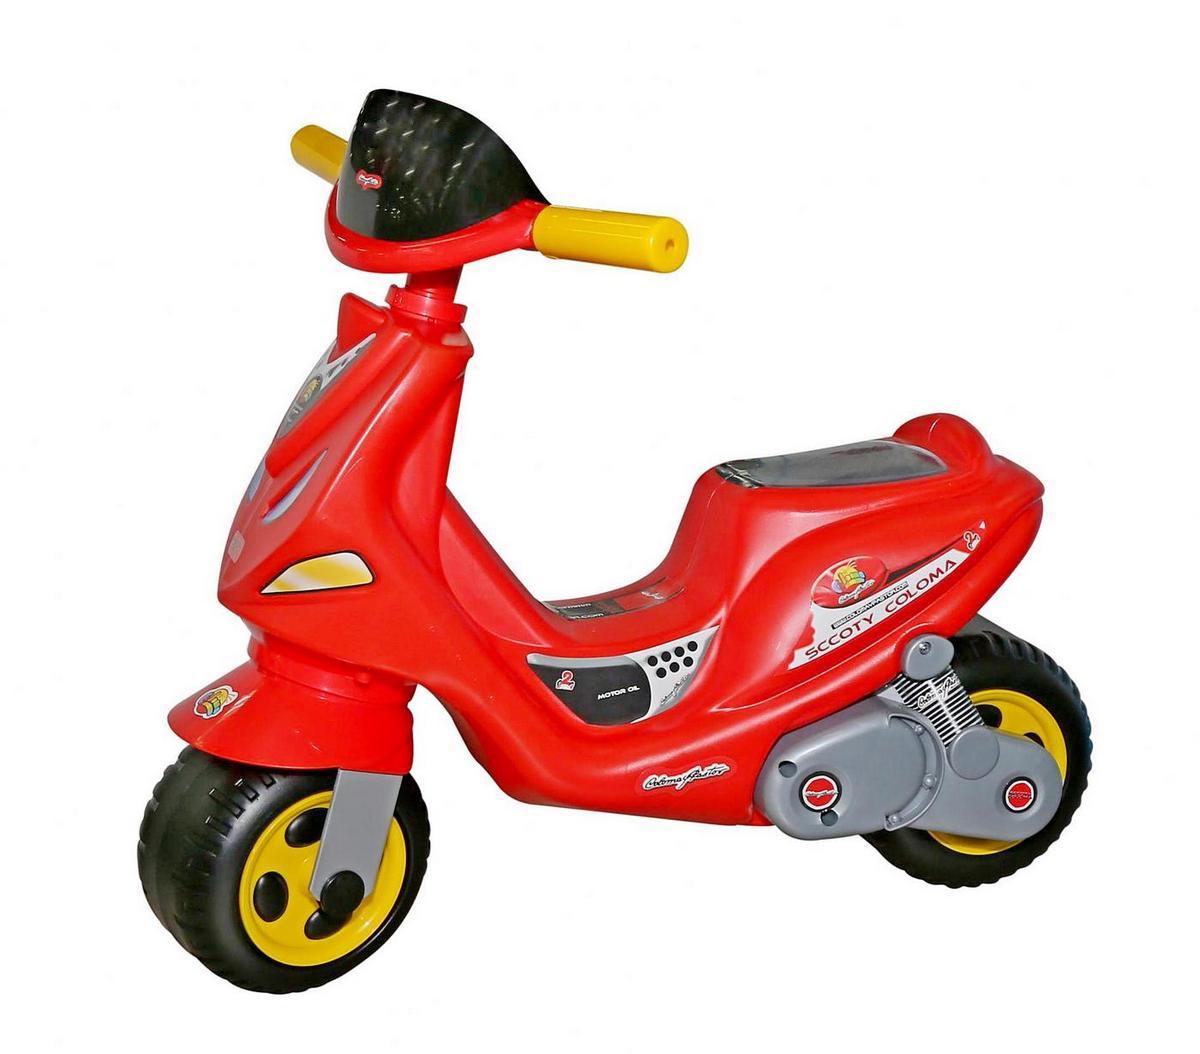 Каталка-скутер Mig Coloma, 4578RTМашинки-каталки для детей<br>Каталка-скутер Mig Coloma, 4578RT<br>